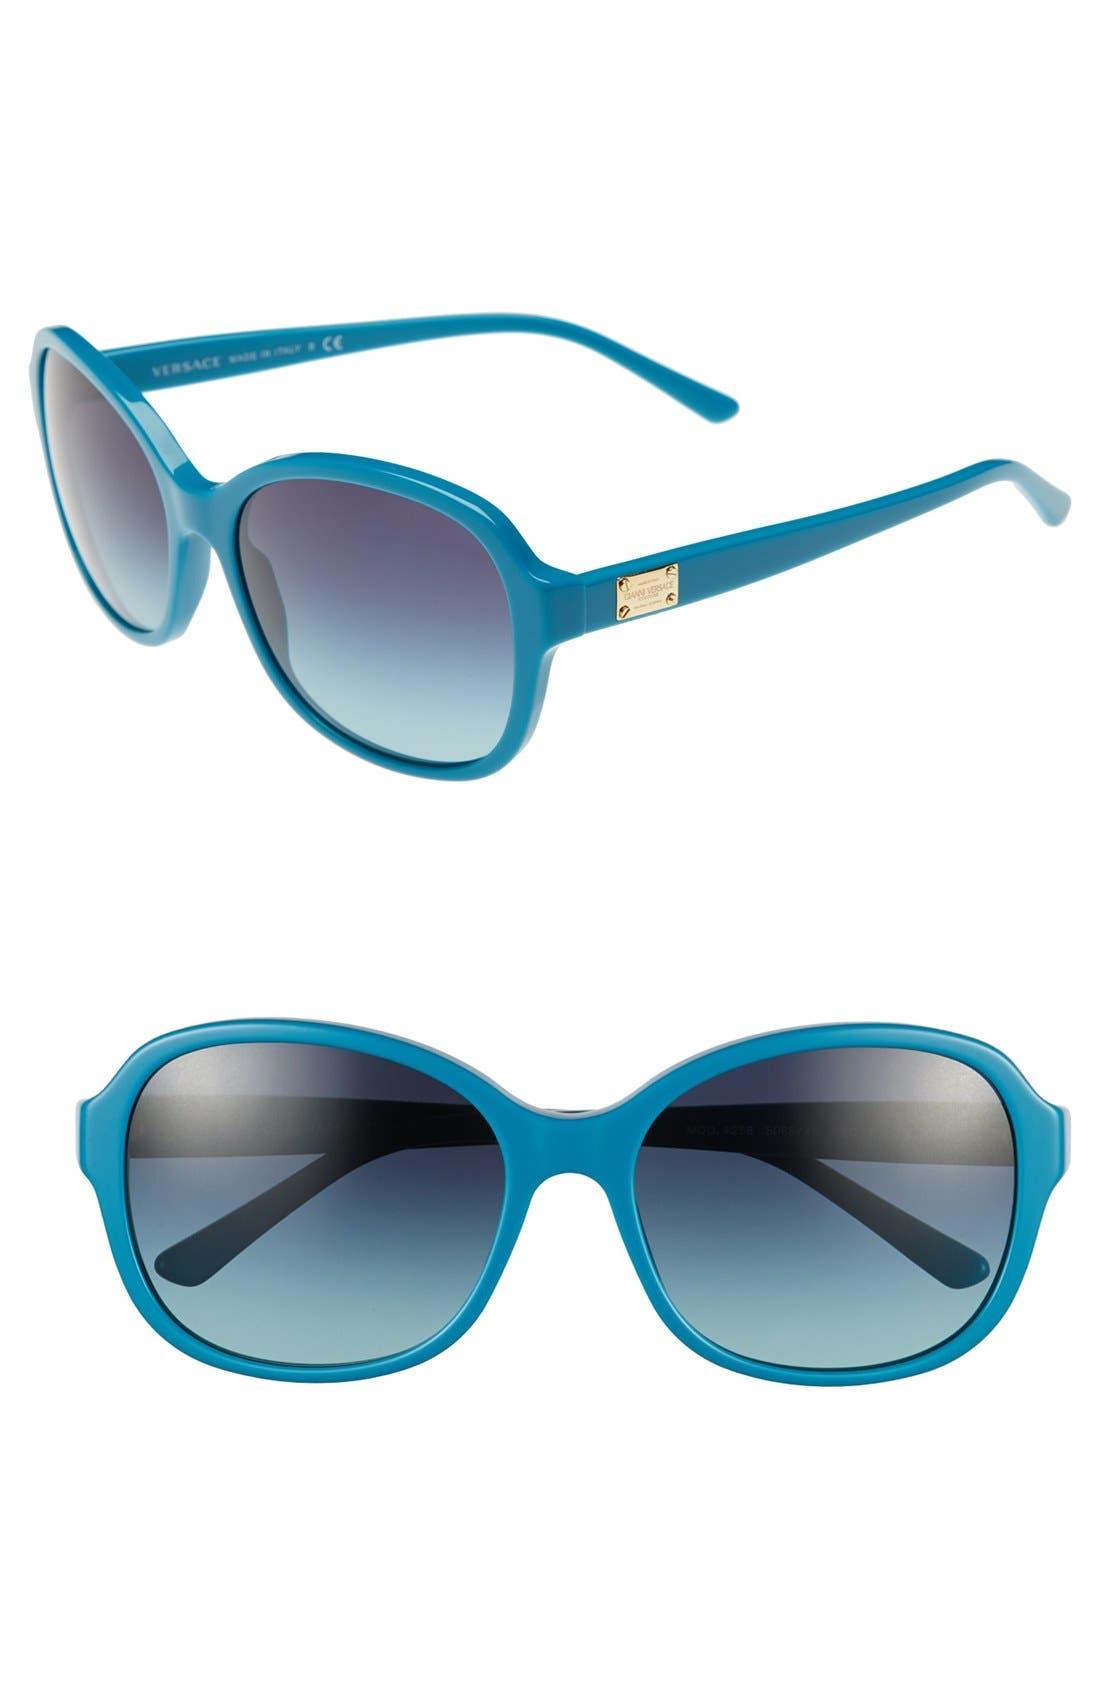 Main Image - Versace 'Pop Chic Culture' 58mm Sunglasses